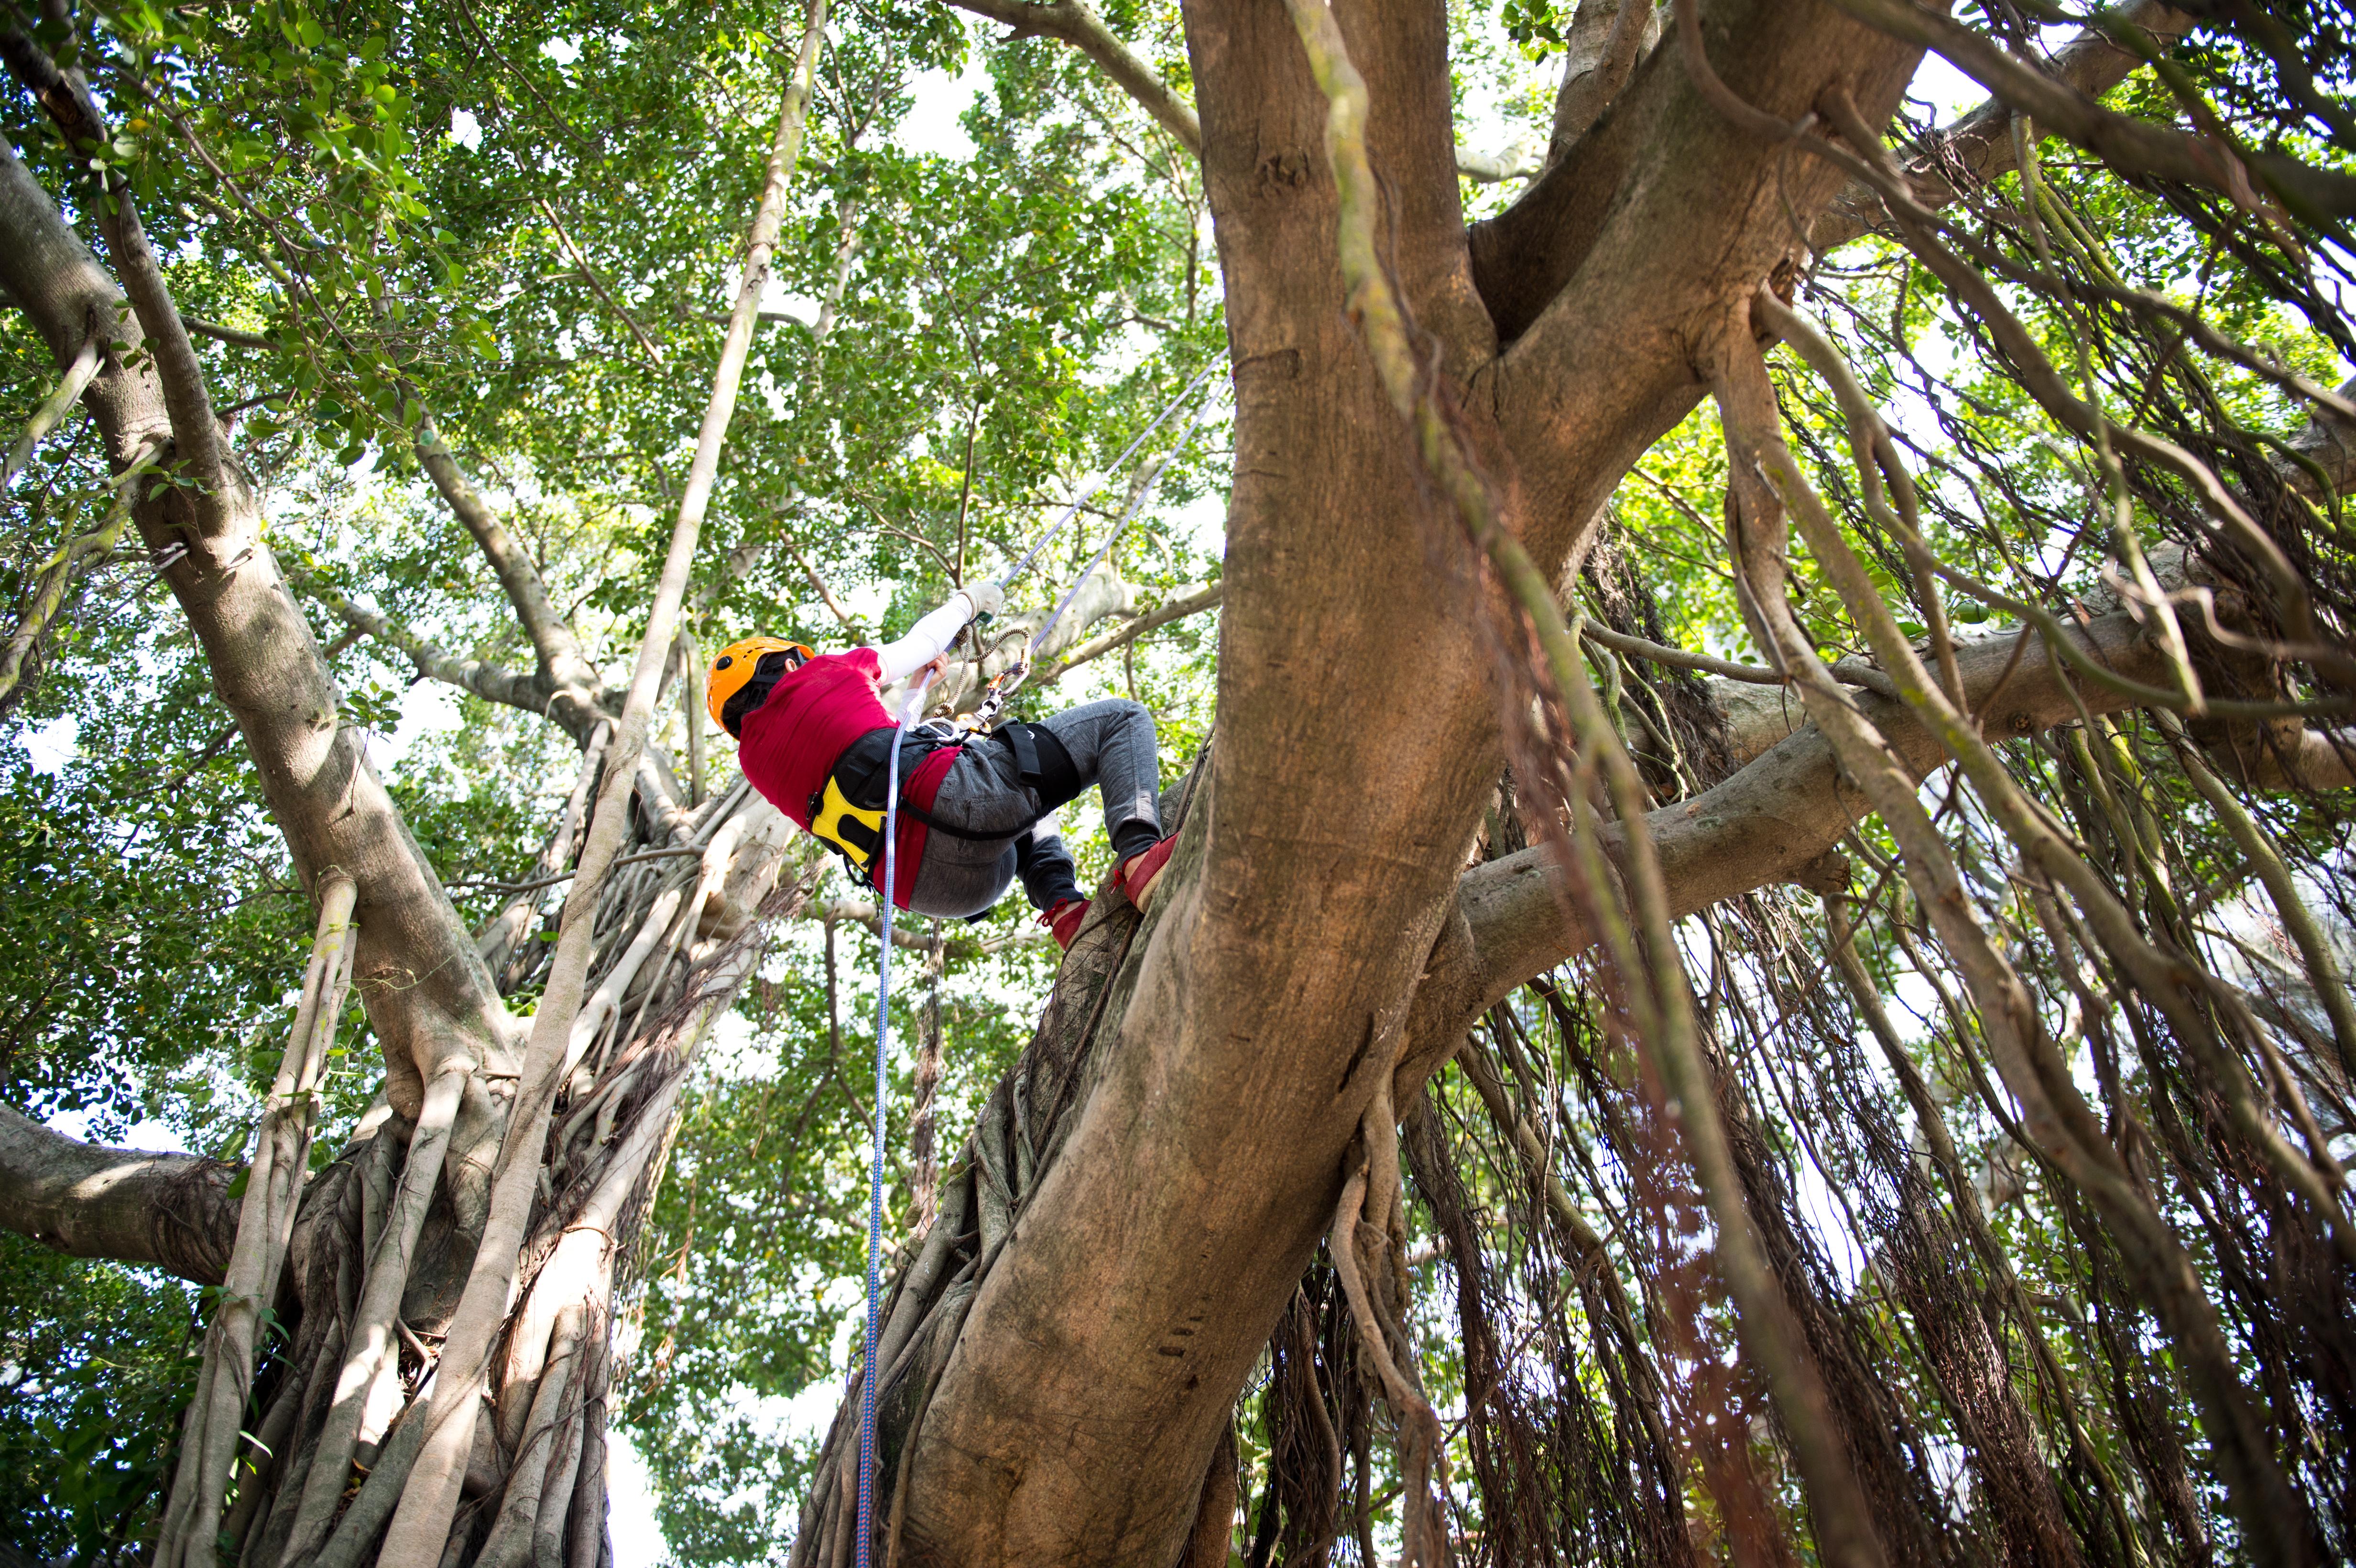 People adventure climbing high tree.